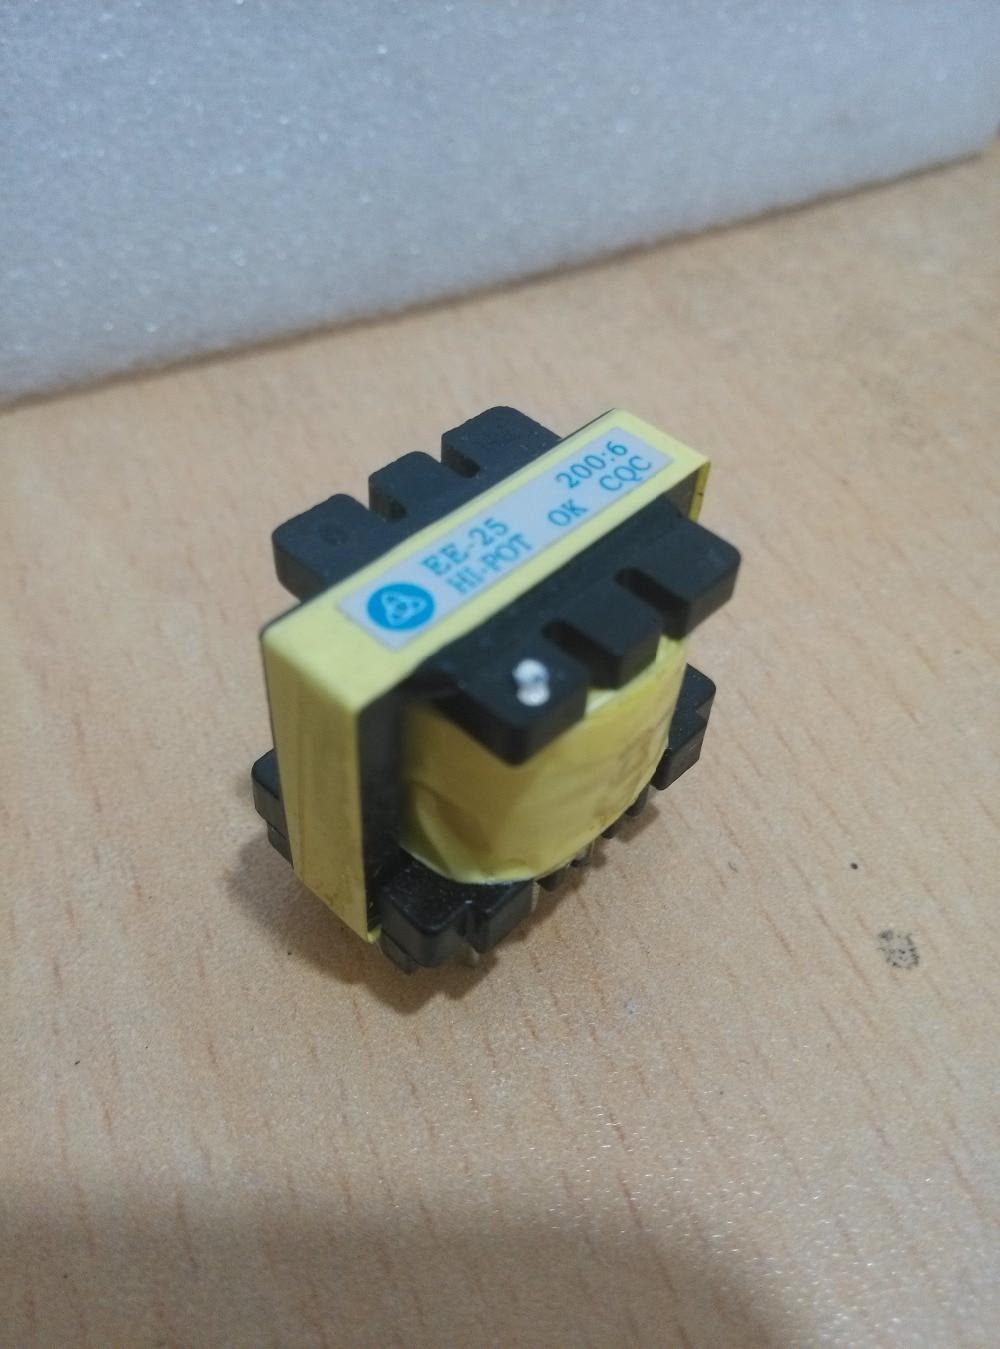 medium resolution of 1pcs ee25 200 6 welding transformer high frequency switch power supply transformer x0098